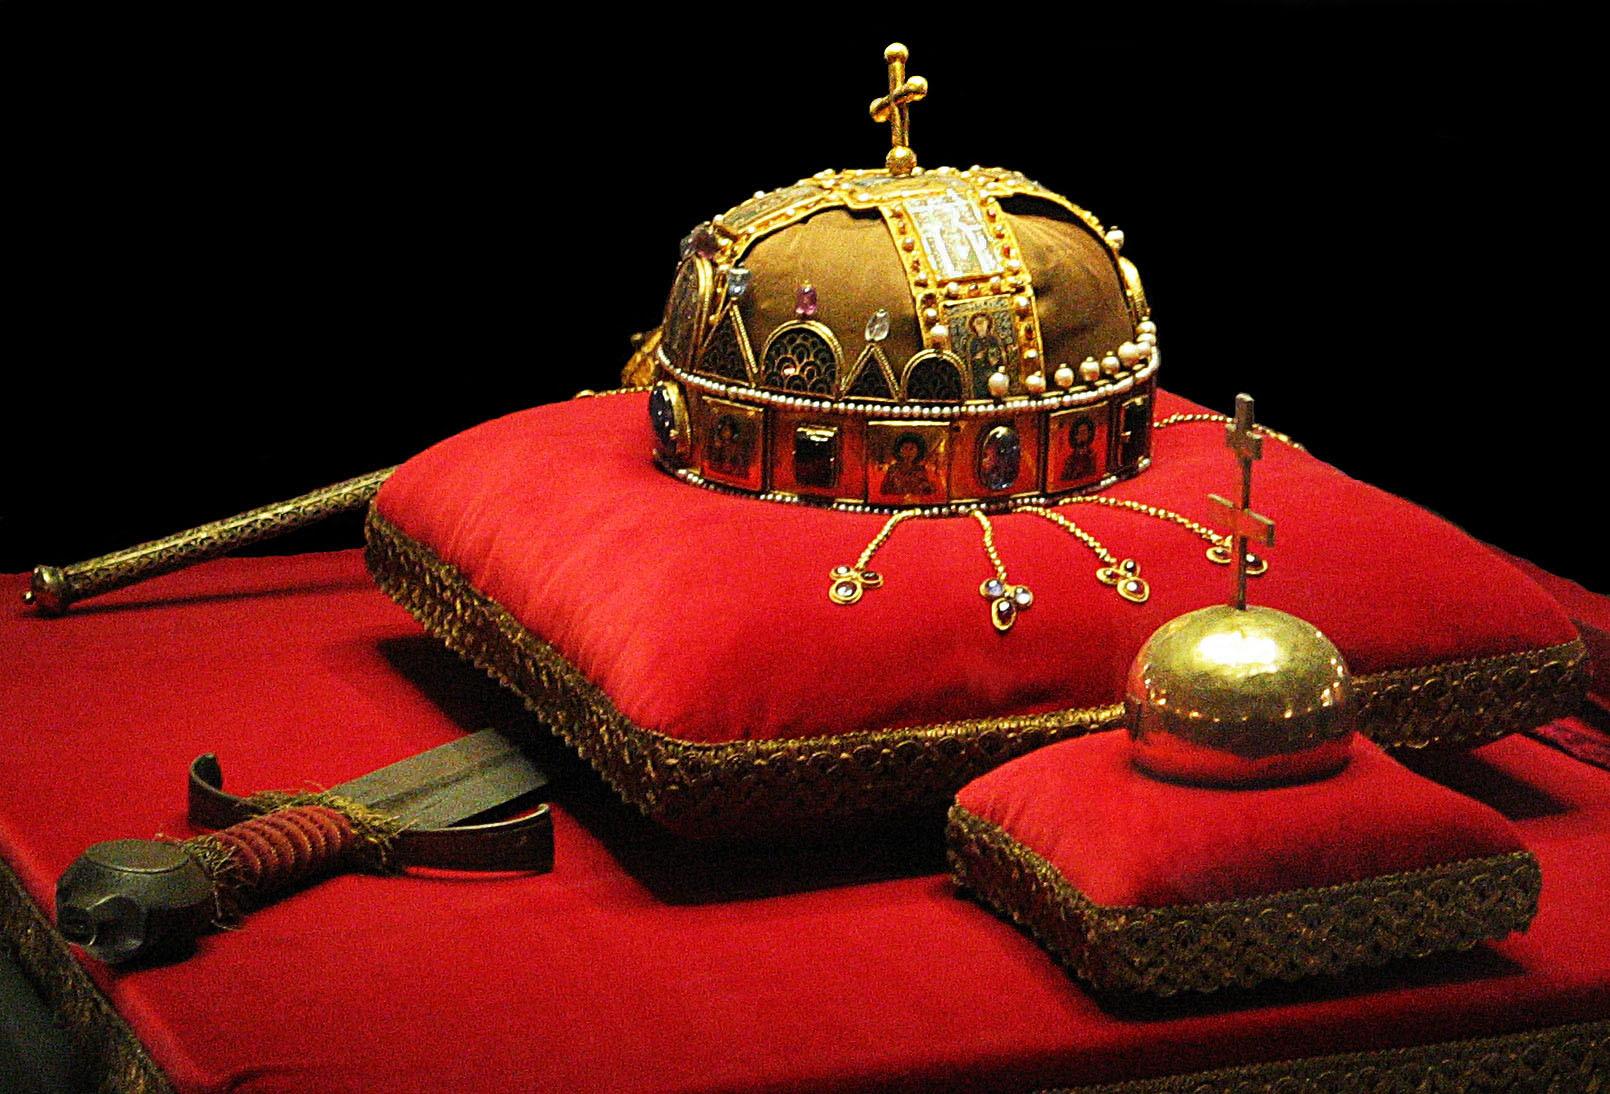 The regalia of the Kingdom of Hungary